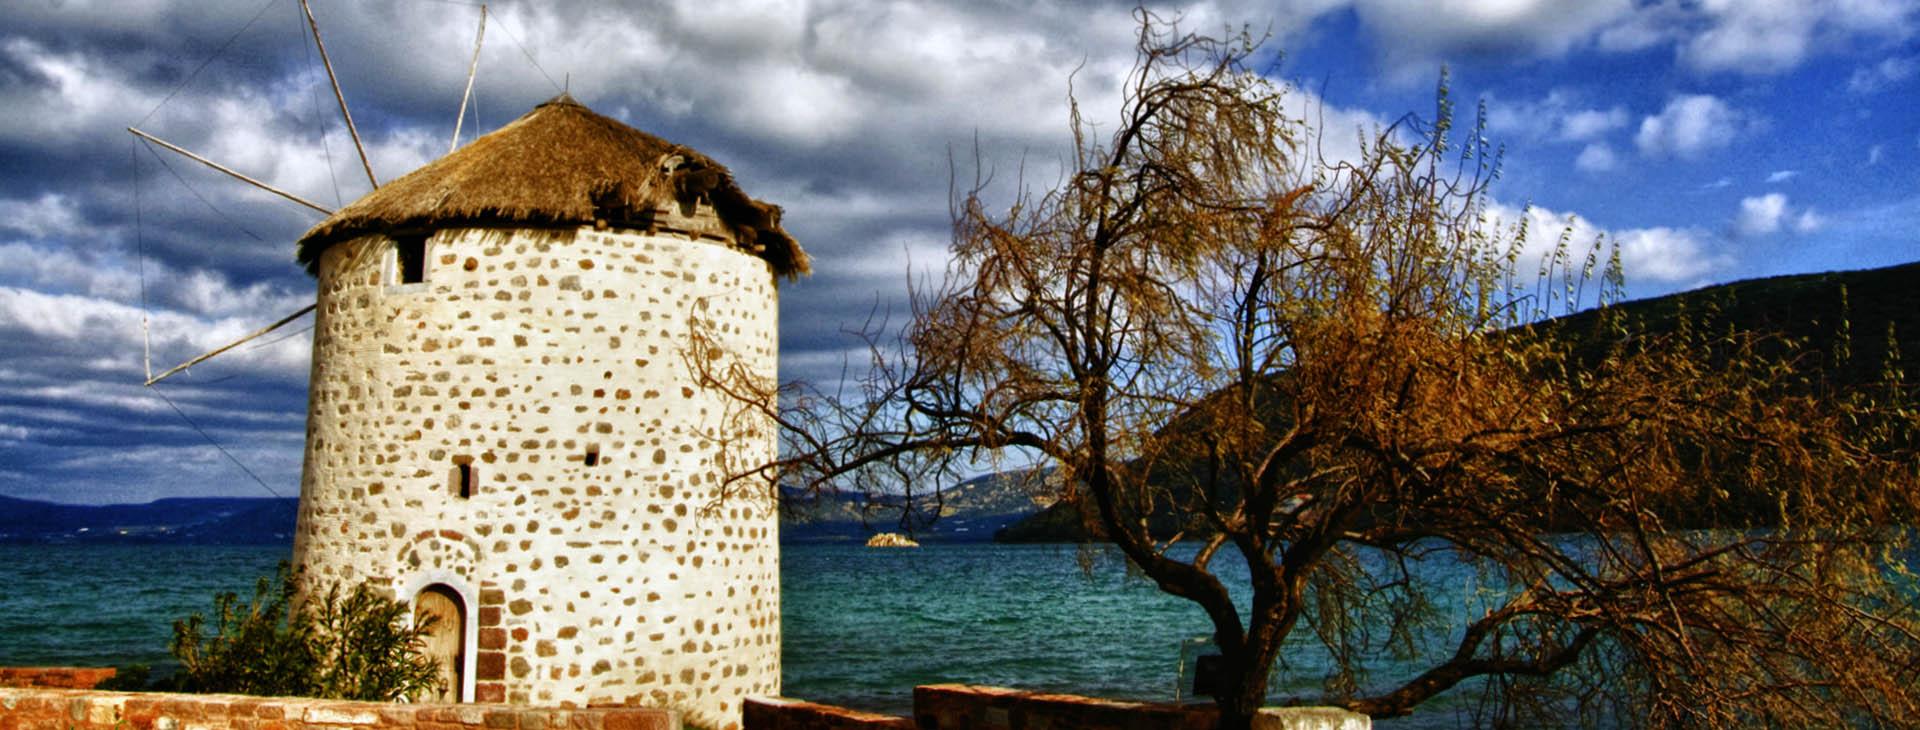 Old windmill at Geras' gulf, Lesvos island